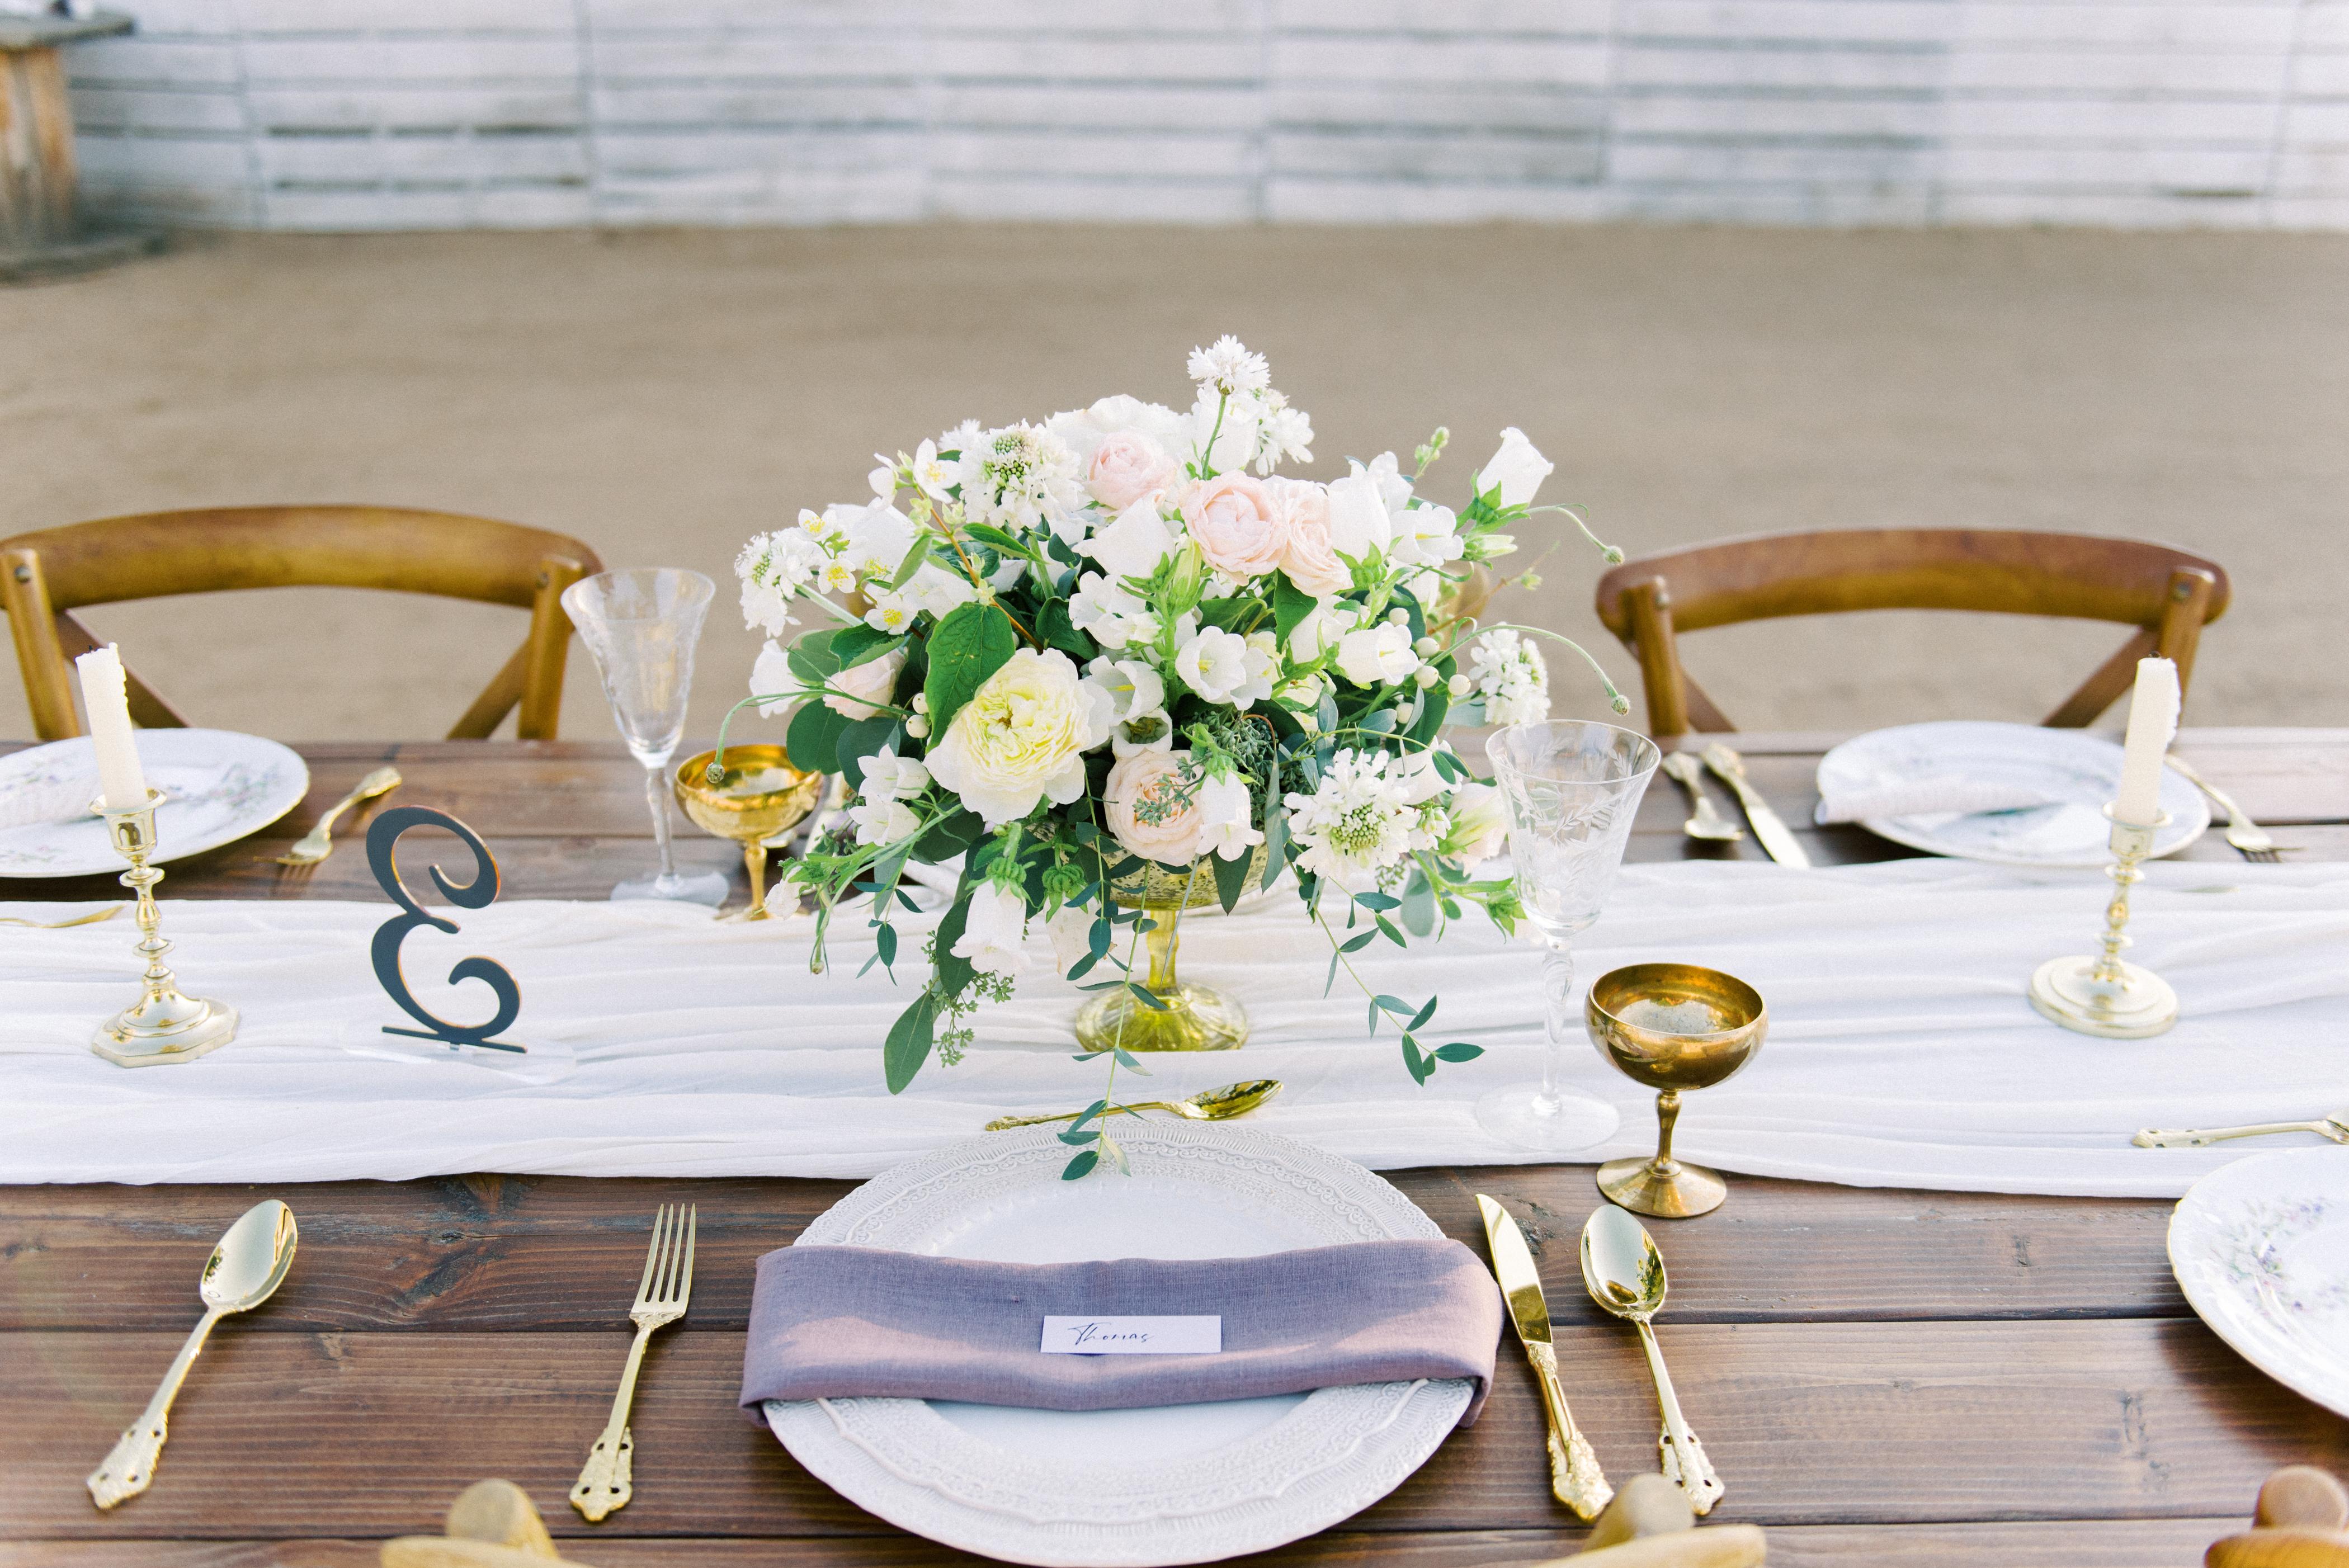 Ivory Rose Lavender Farm Wedding Centerpiece